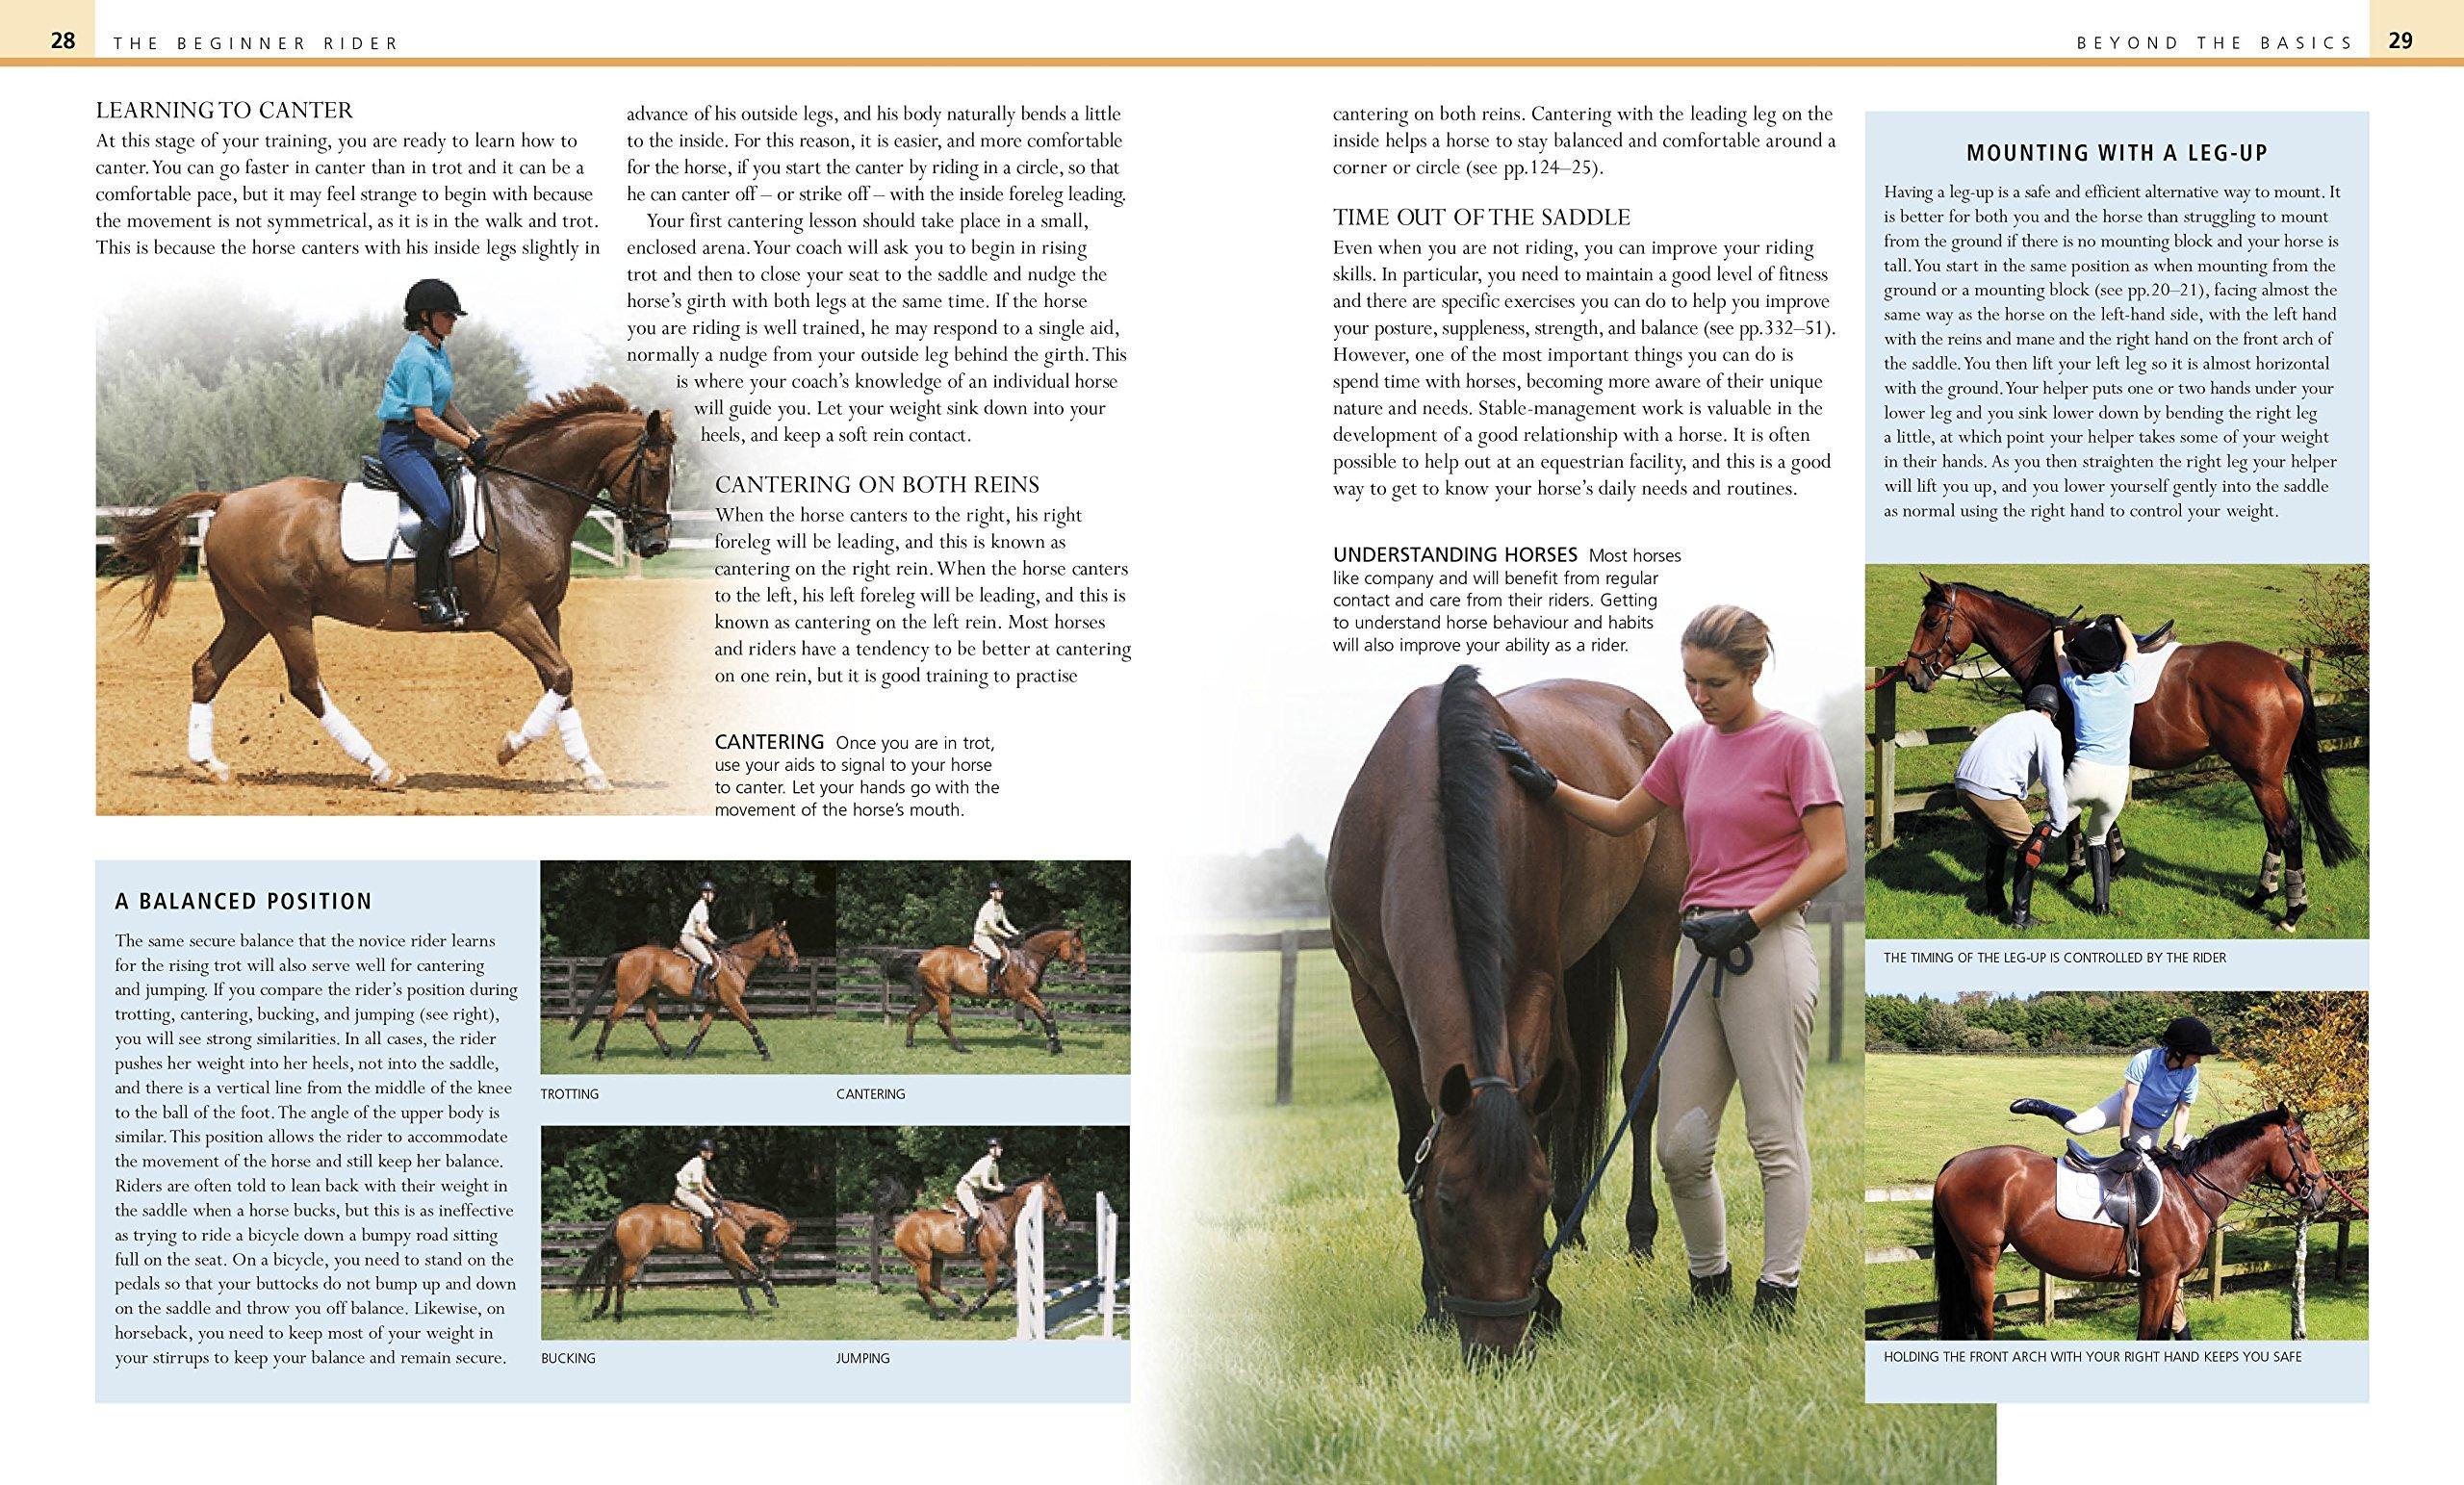 Complete Horse Riding Manual: Amazon.co.uk: William Micklem: 8601200498714:  Books